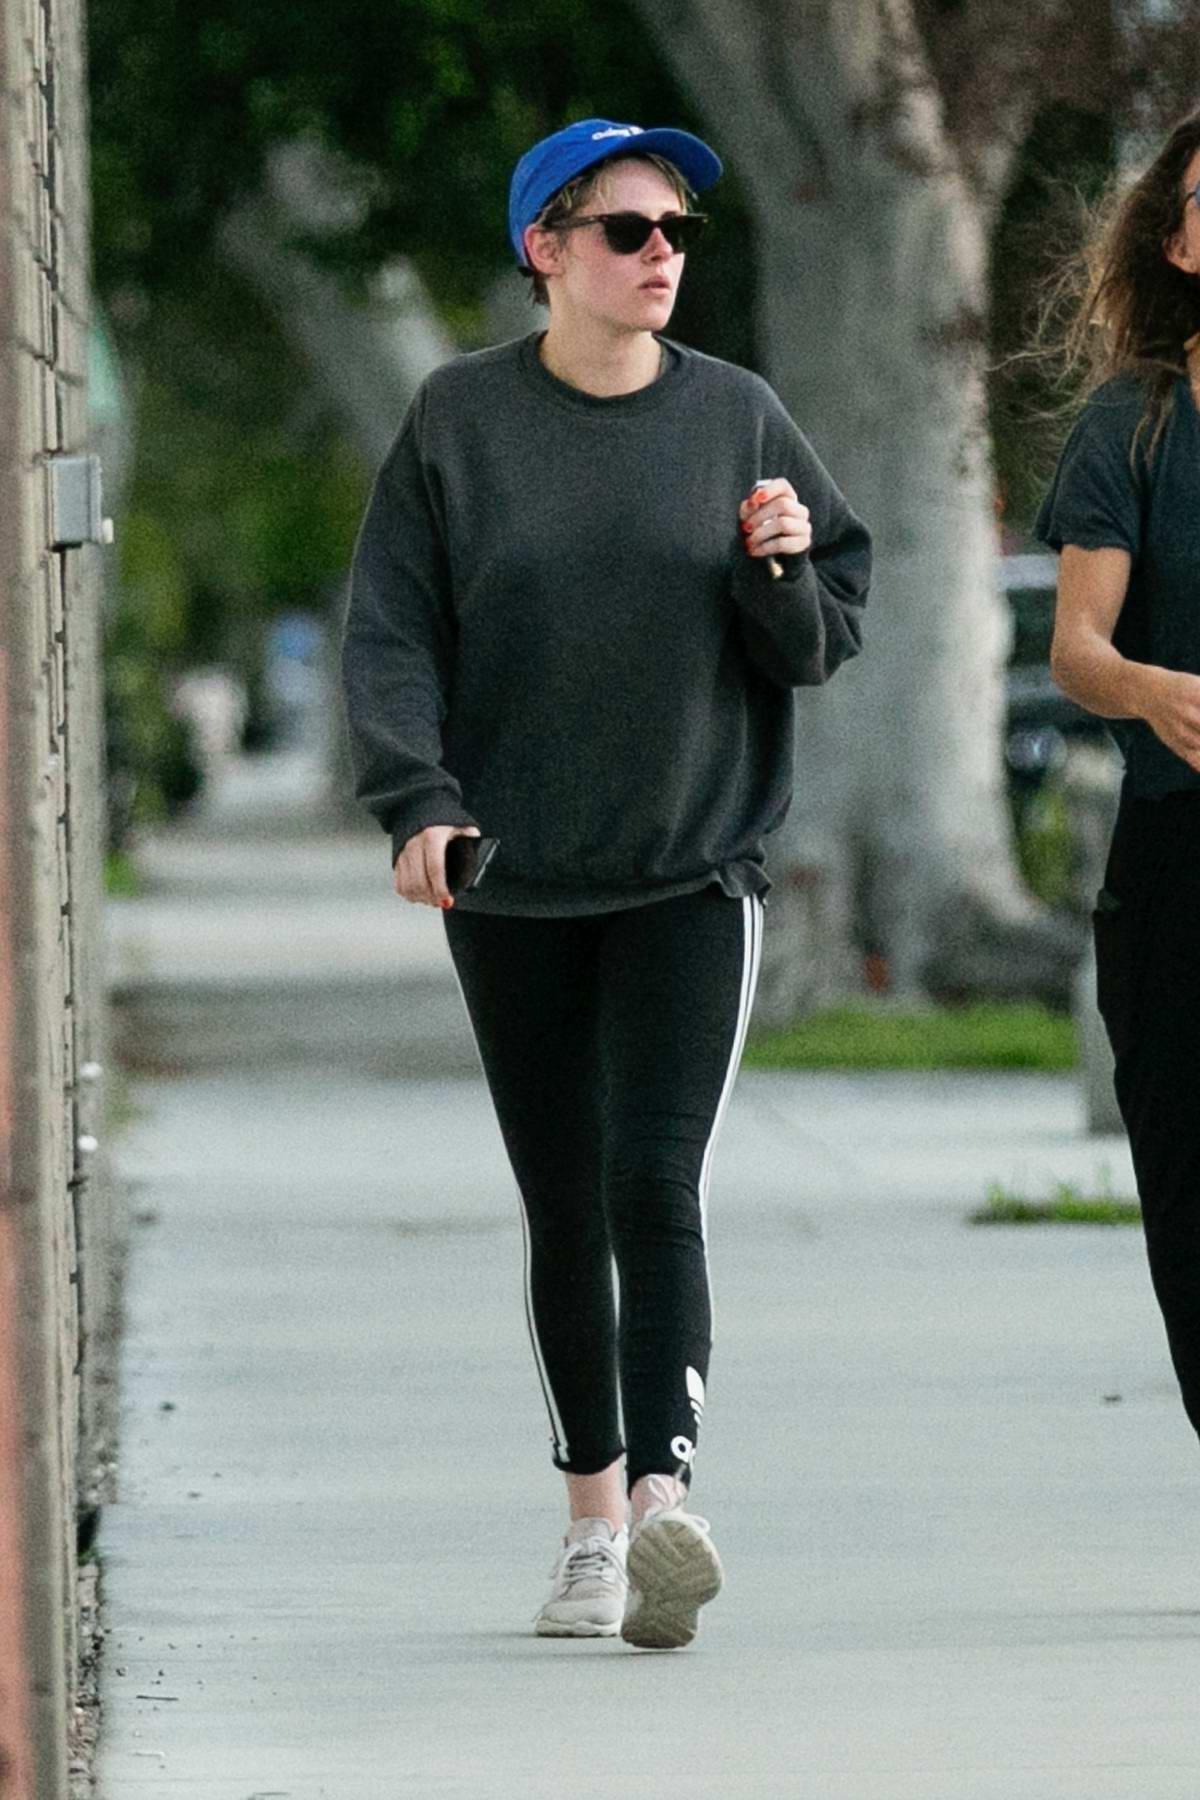 Kristen Stewart keeps it casual in a grey sweatshirt and black leggings while visiting a spa in Los Angeles